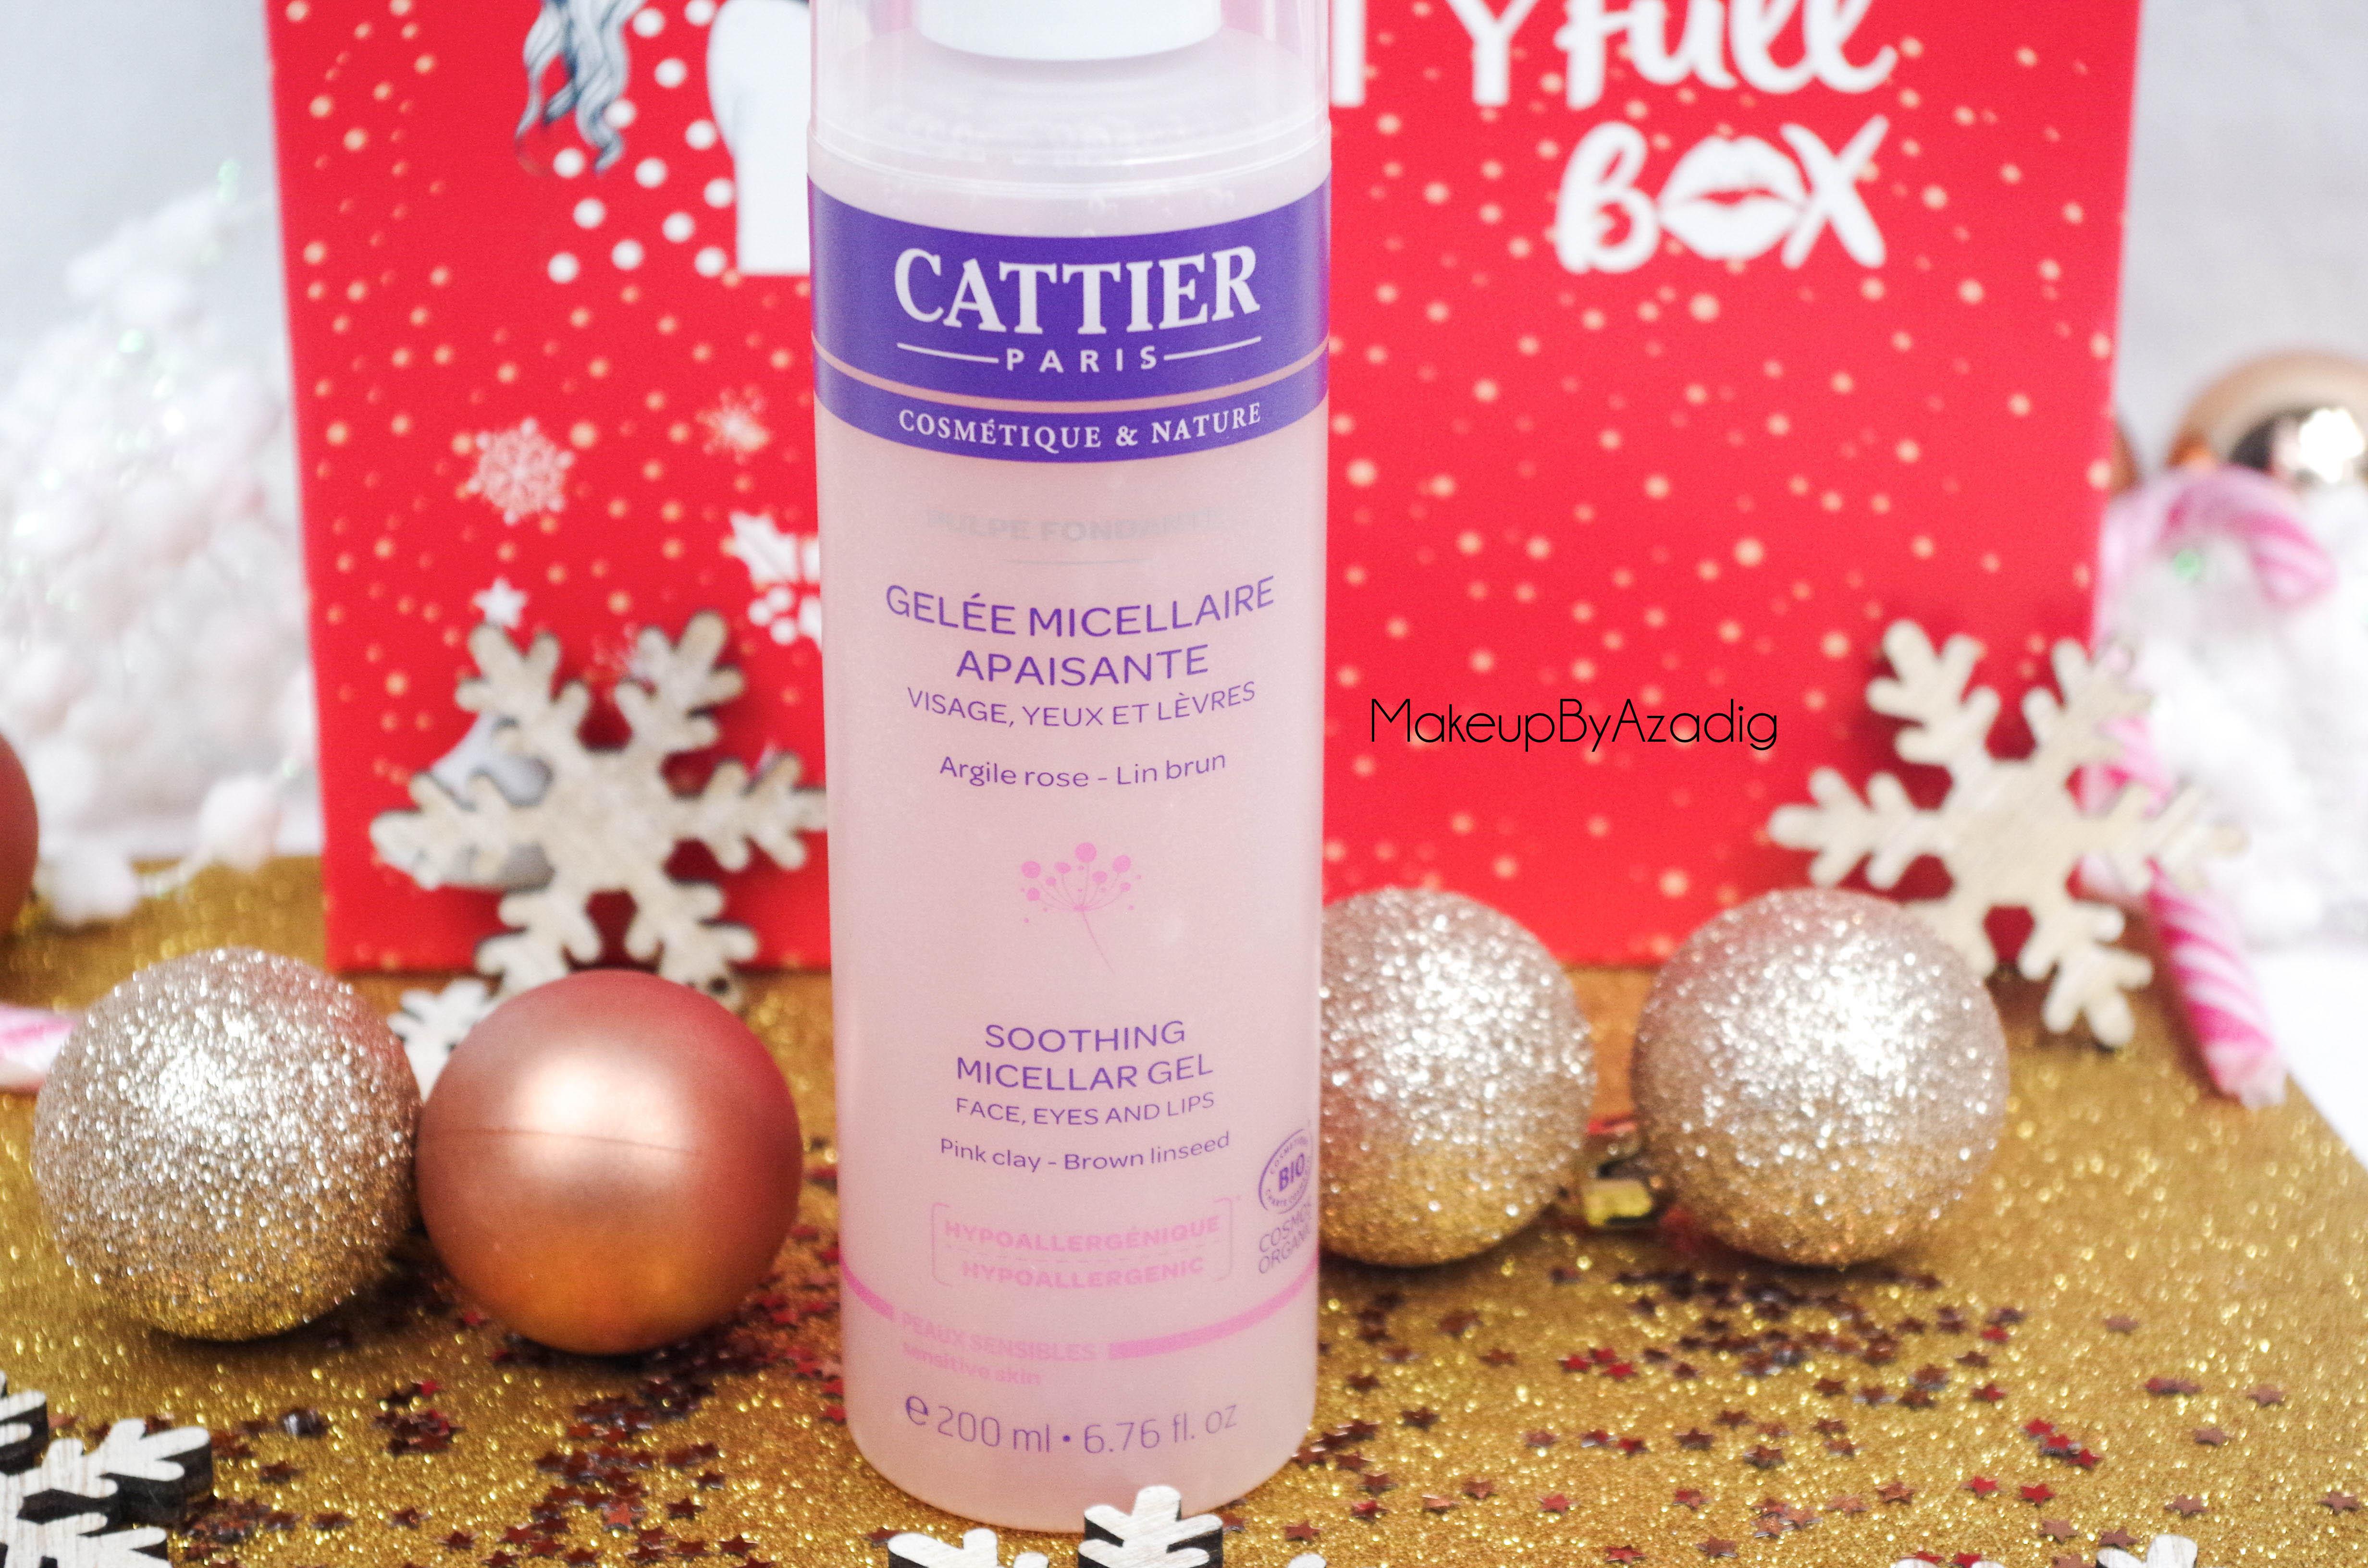 biotyfull-box-beaute-makeupbyazadig-revue-avis-prix-troyes-paris-produits-bio-cattier